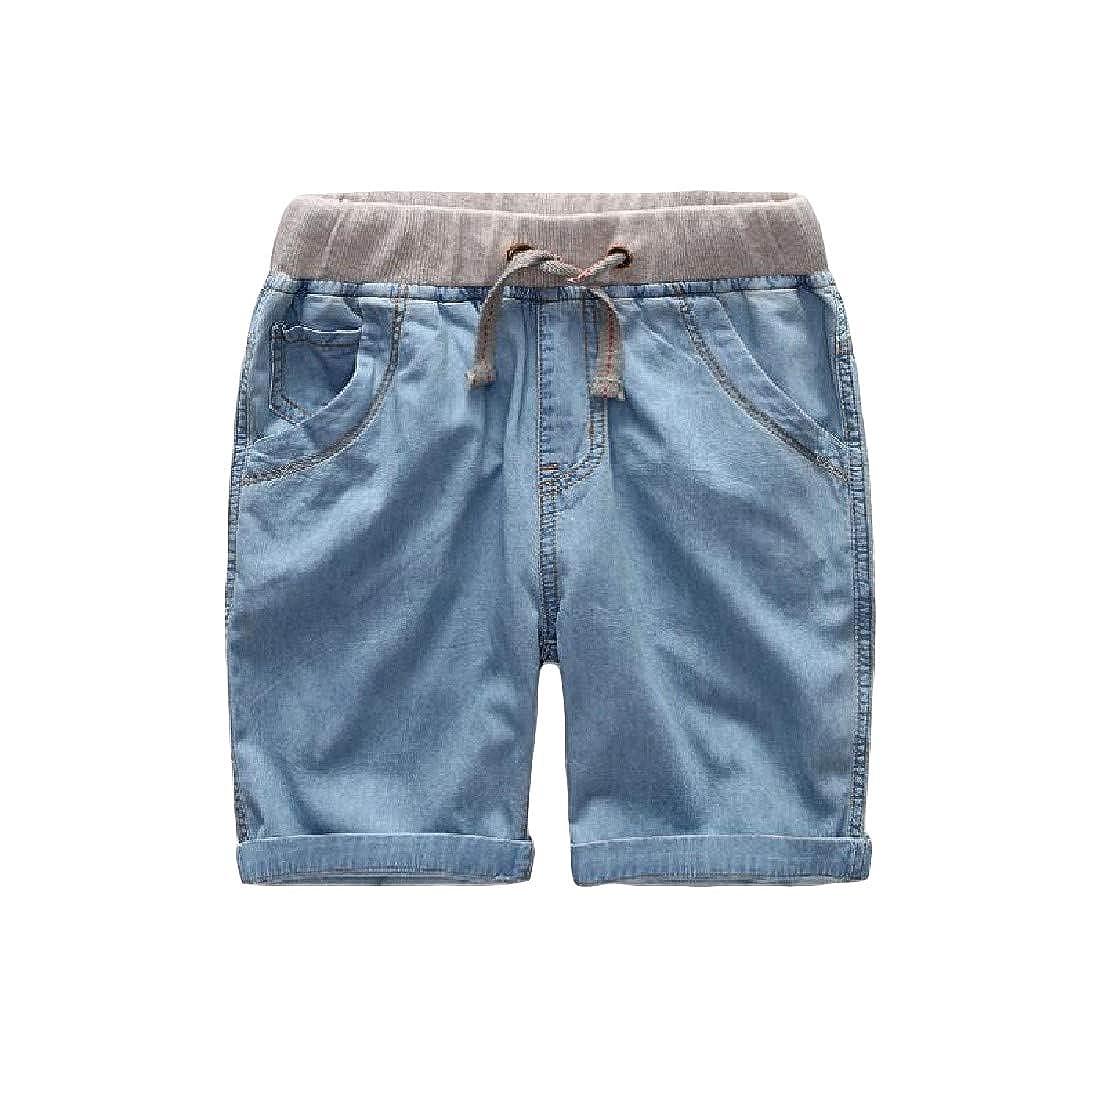 Macondoo Boys Classical Jean Denim Elastic Waist Cotton Shorts